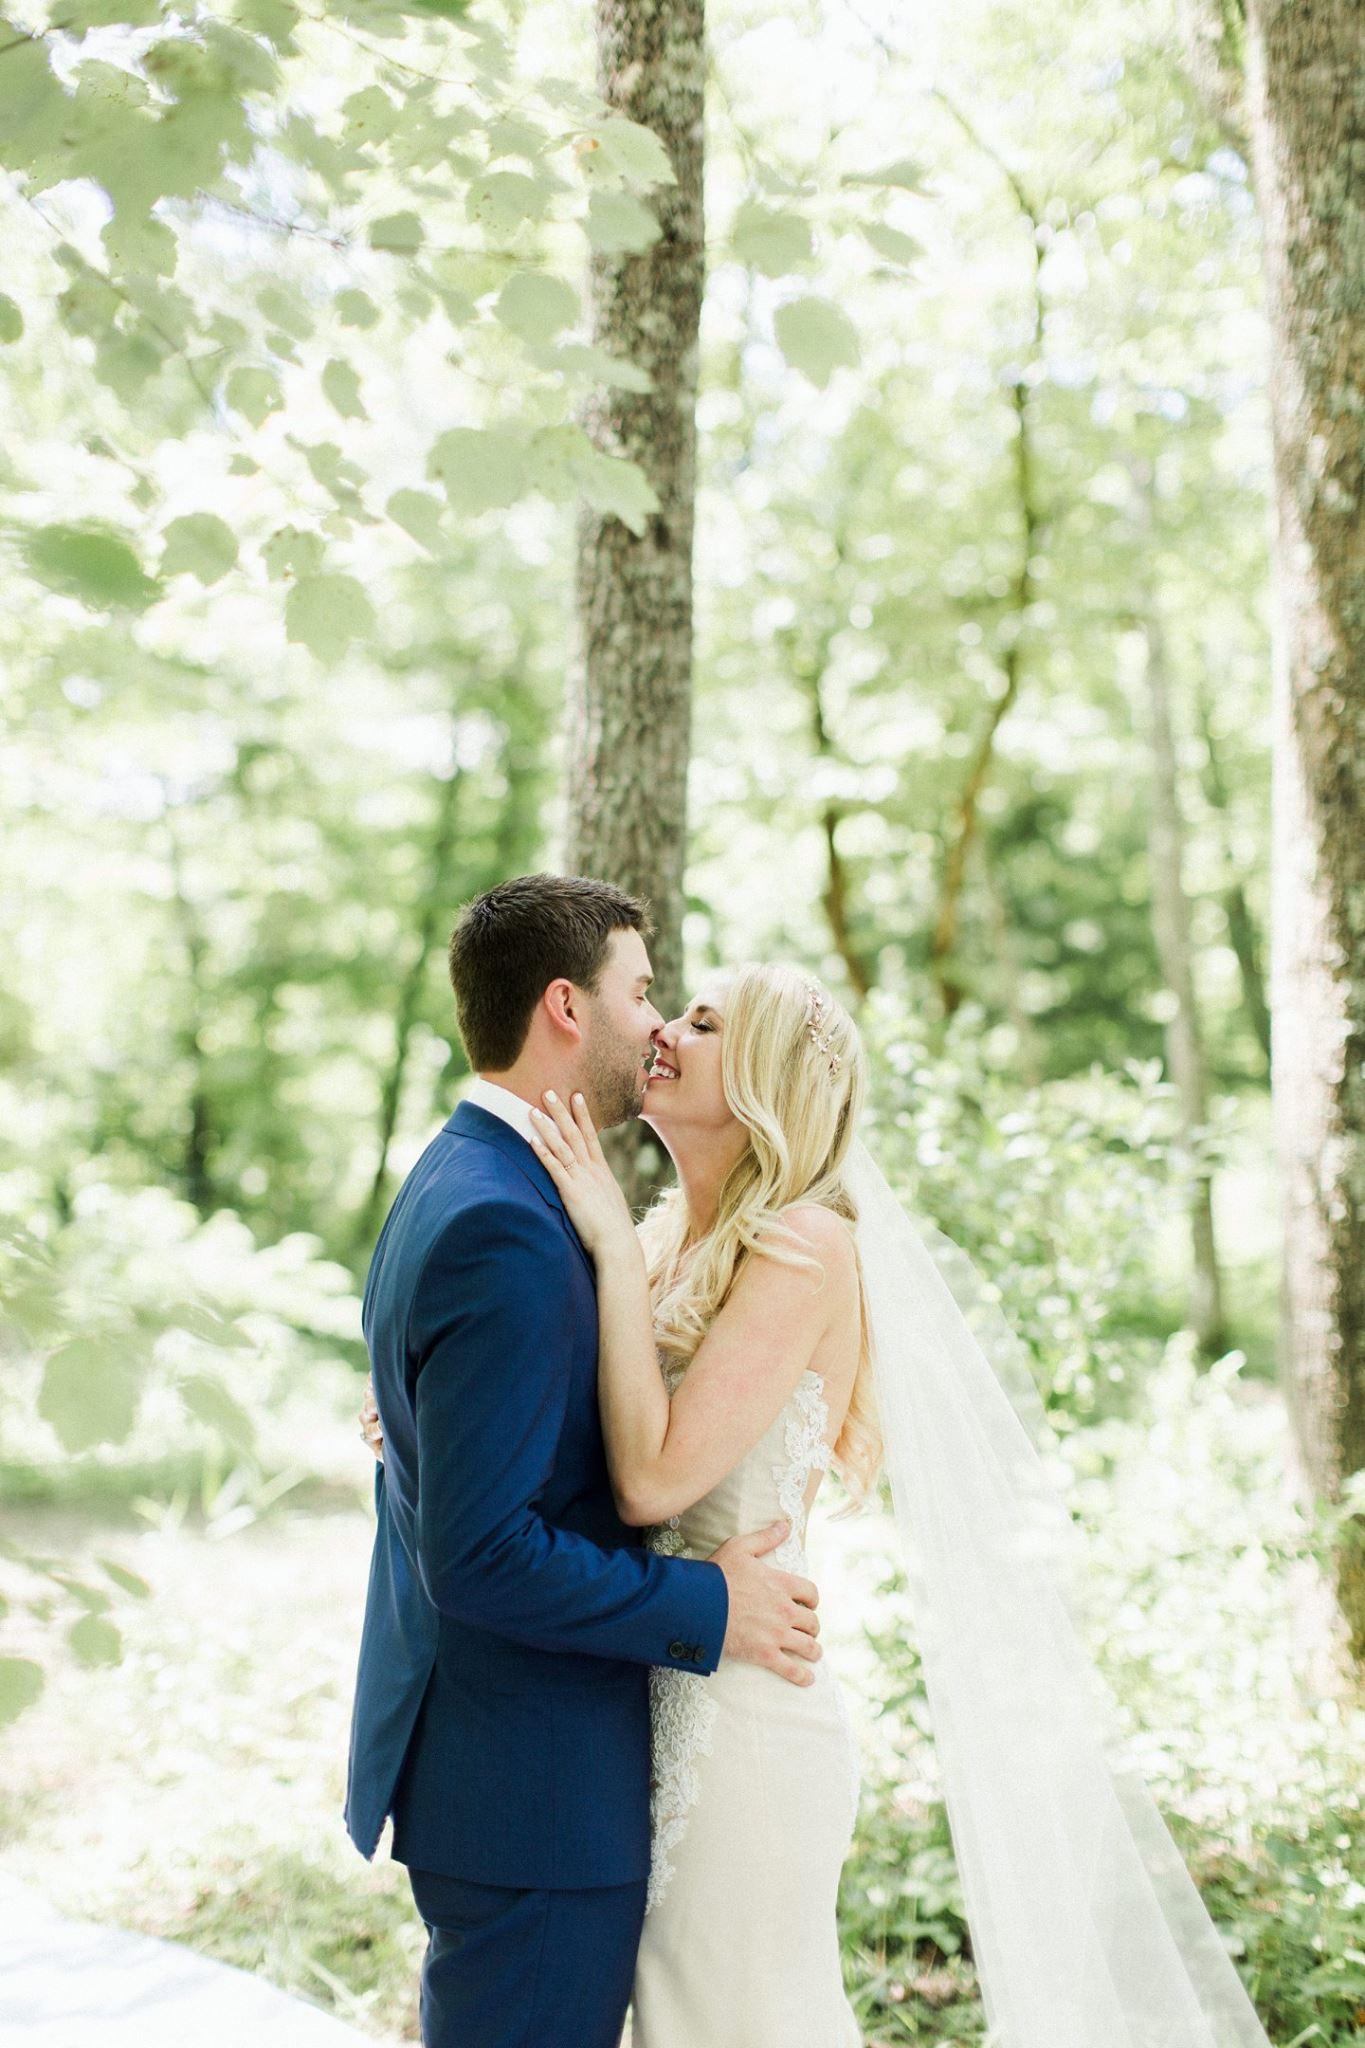 kari wearing ines di santo wedding dress with girl and a serious dream veil